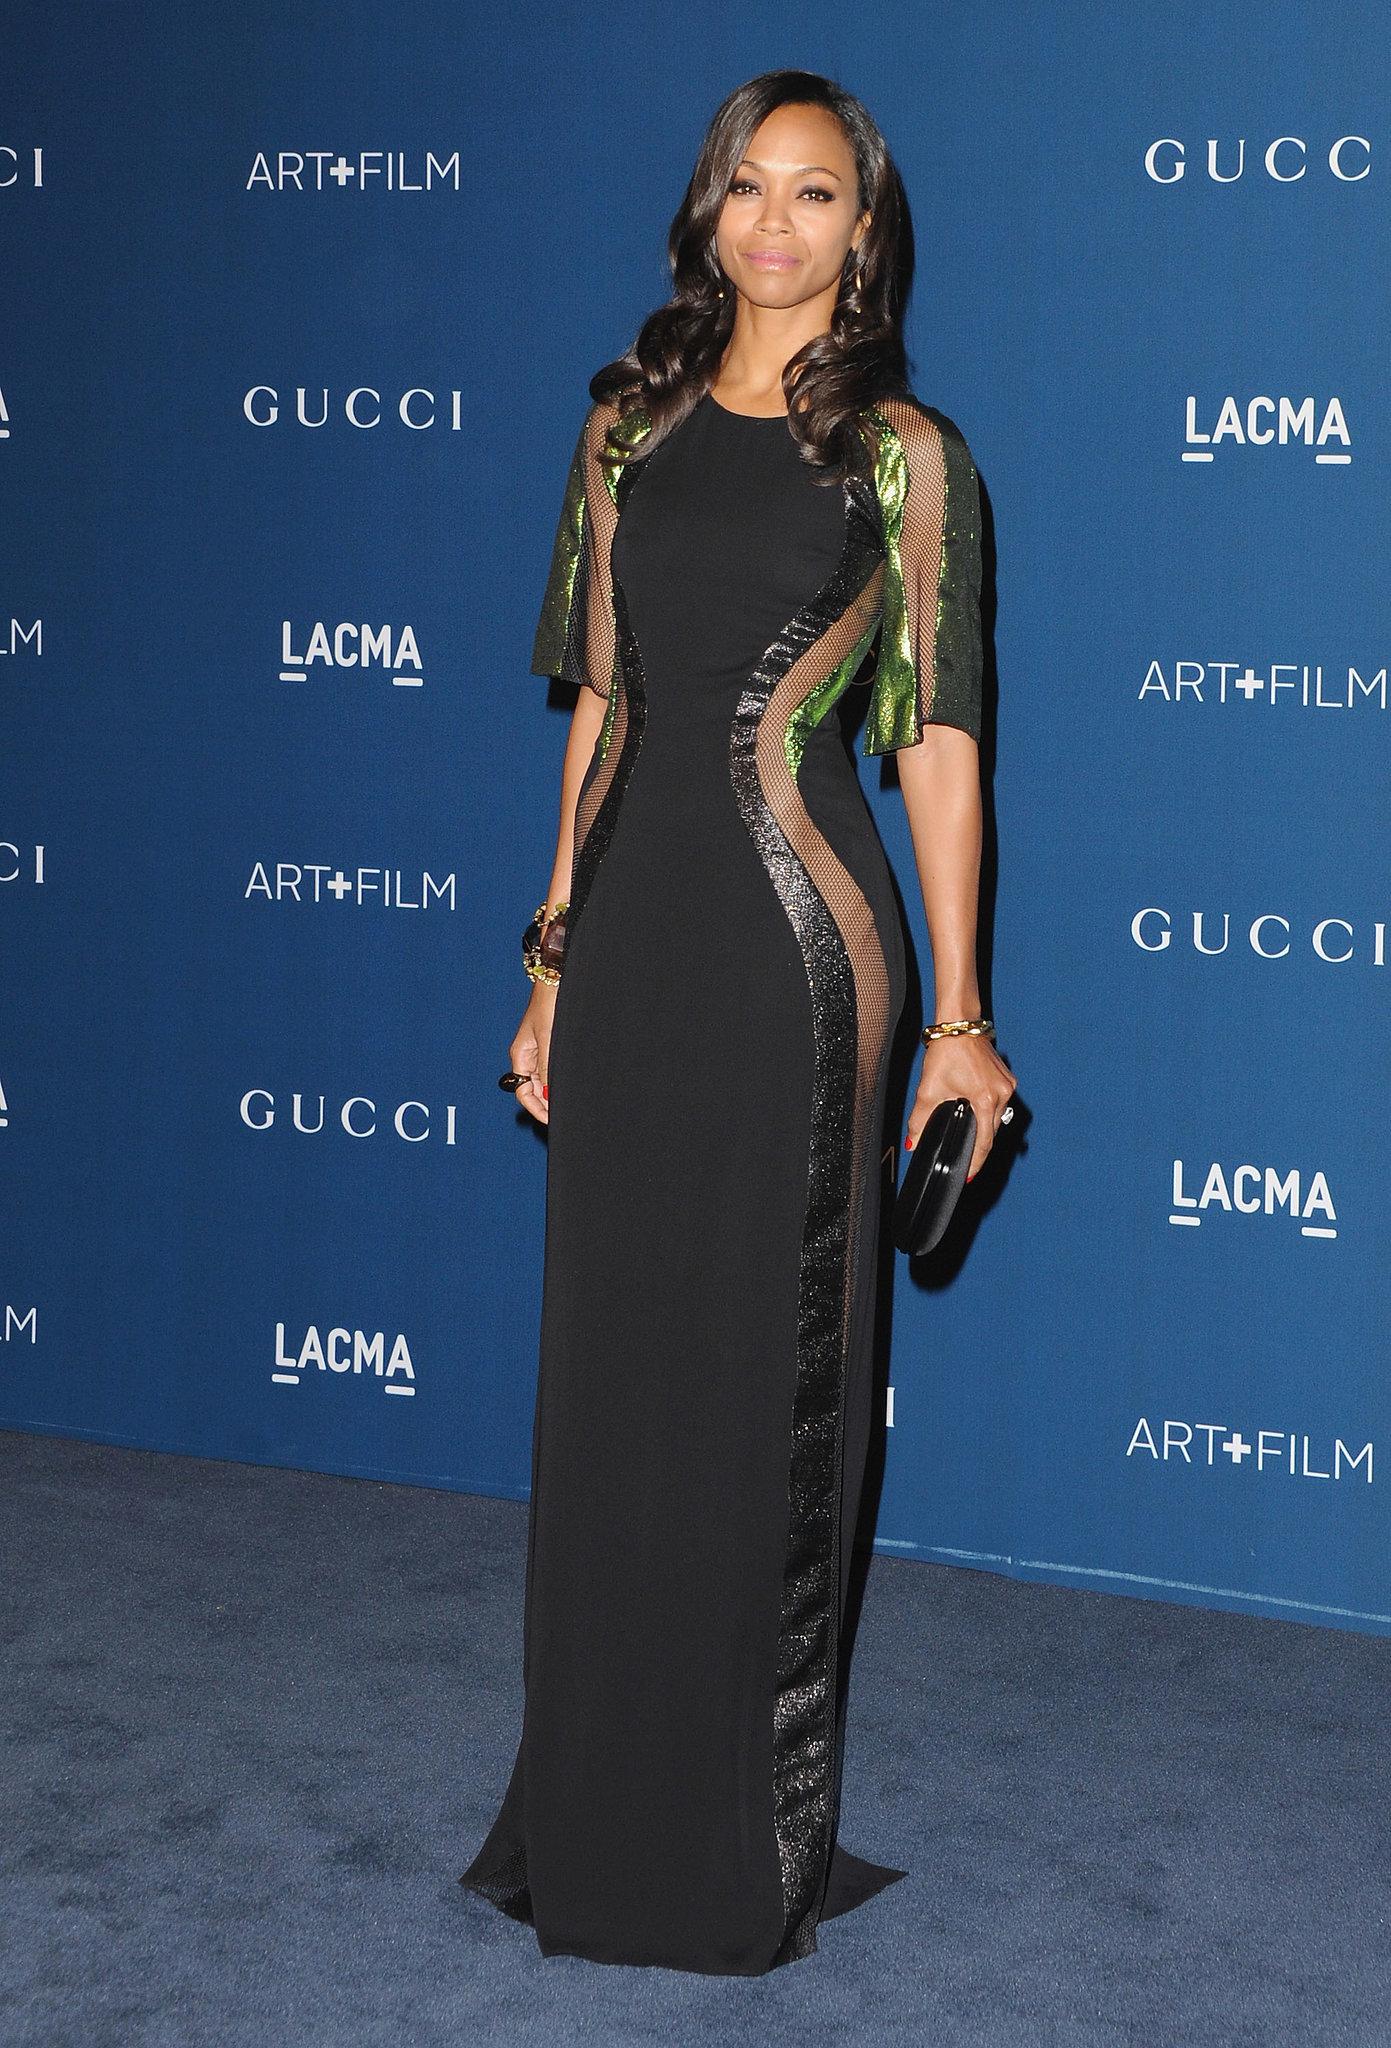 Zoe Saldana at the LACMA Film Gala